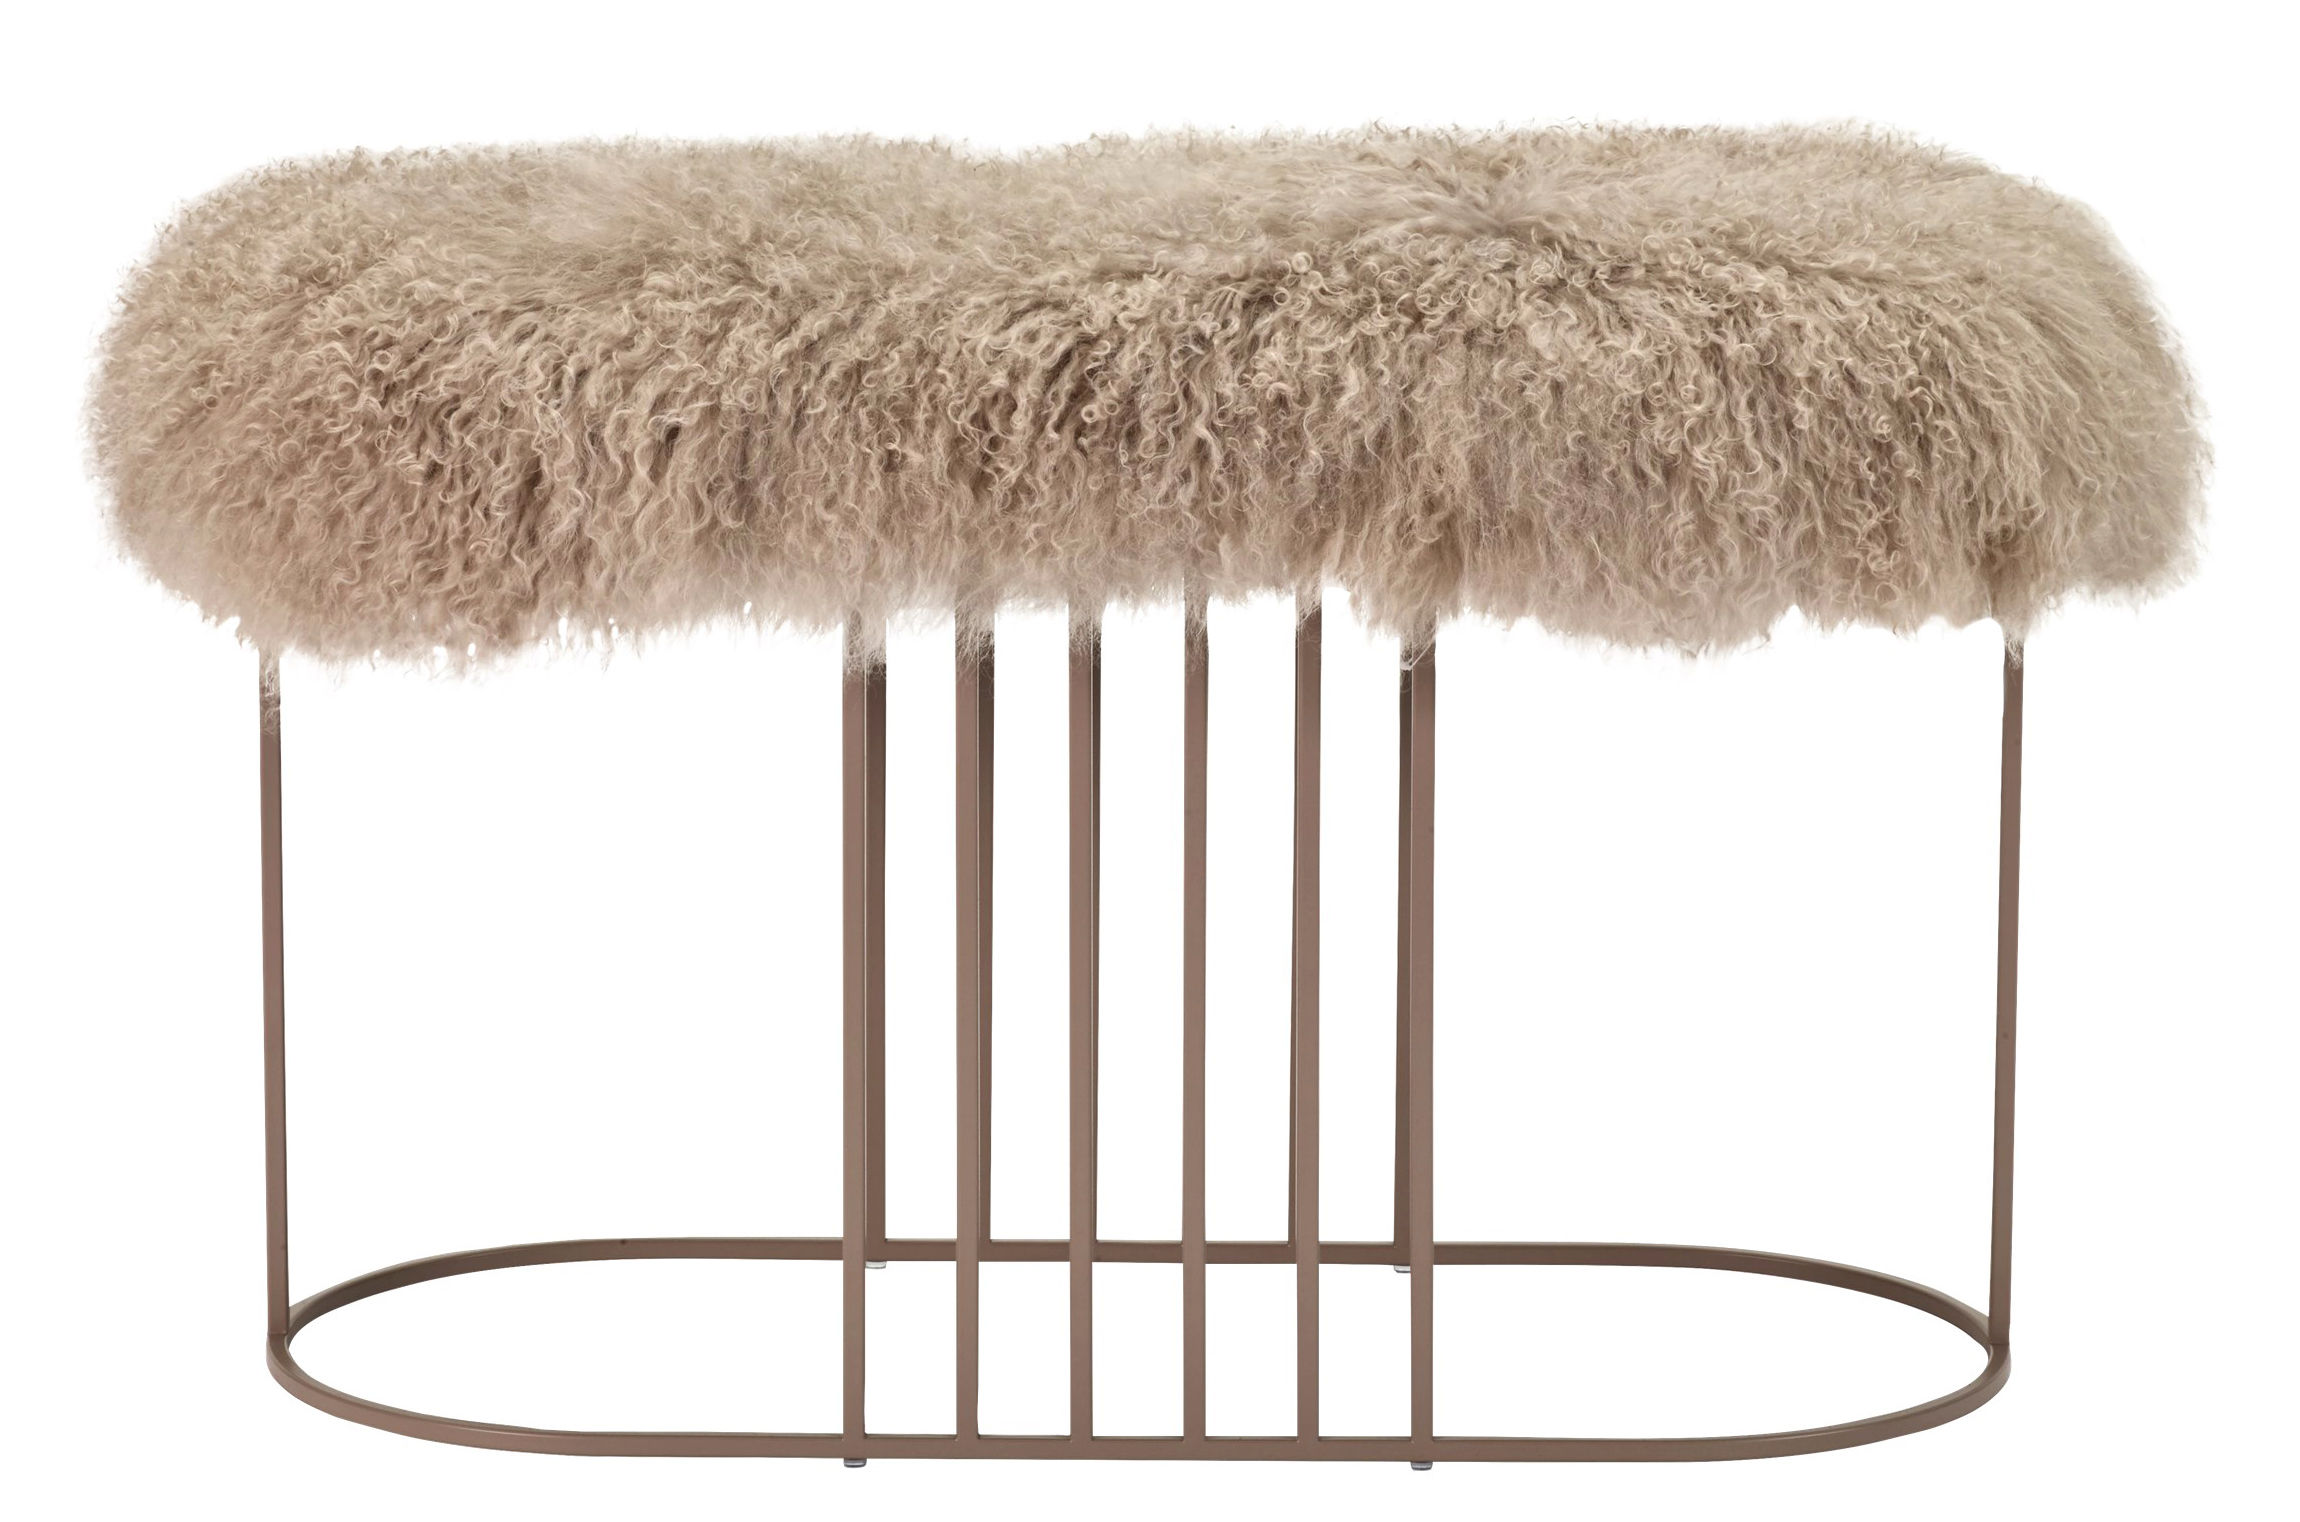 Arredamento - Pouf - Panca imbottita Posea Furry - / Pelle di pecora tibetana - L 80 cm di Bolia - Rosa / Base rosa - Acciaio verniciato, Espanso, Peau de mouton tibétaine